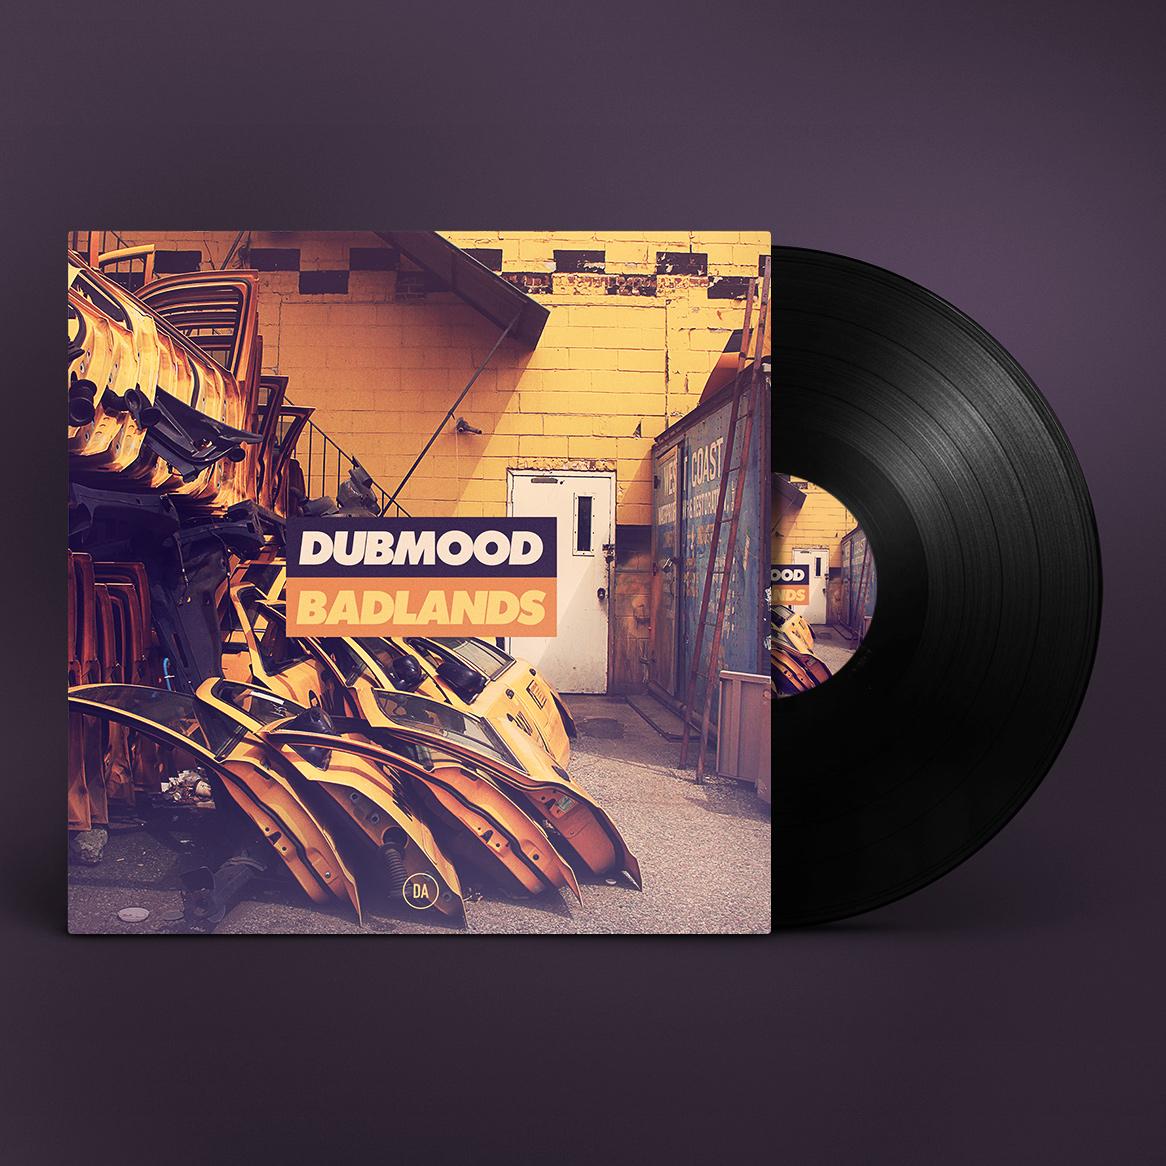 Dubmood — Badlands